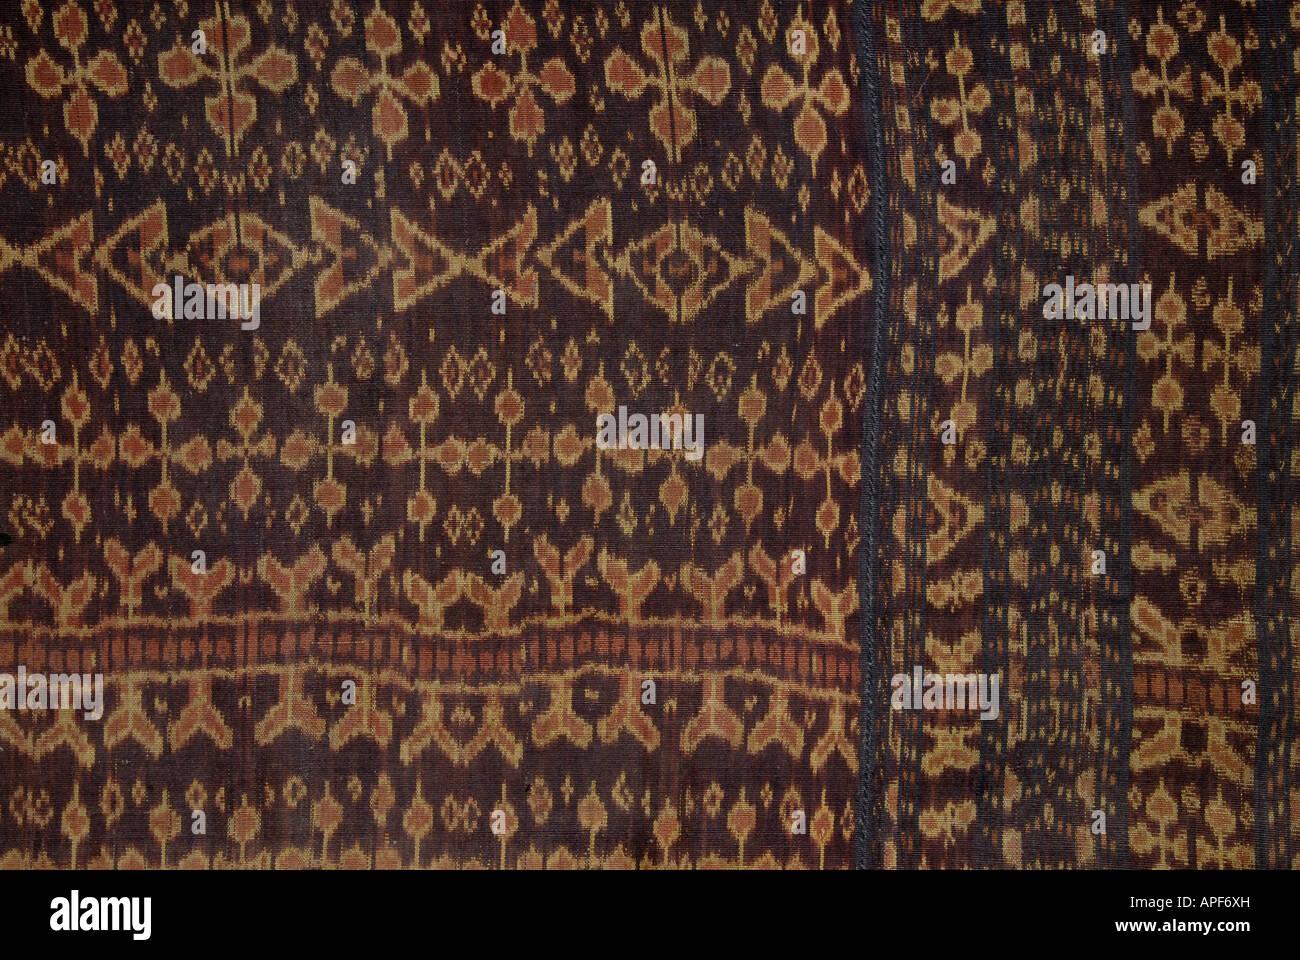 Detail of a warp ikat decorated hinggi from Nusa Tengarra Indonesi - Stock Image